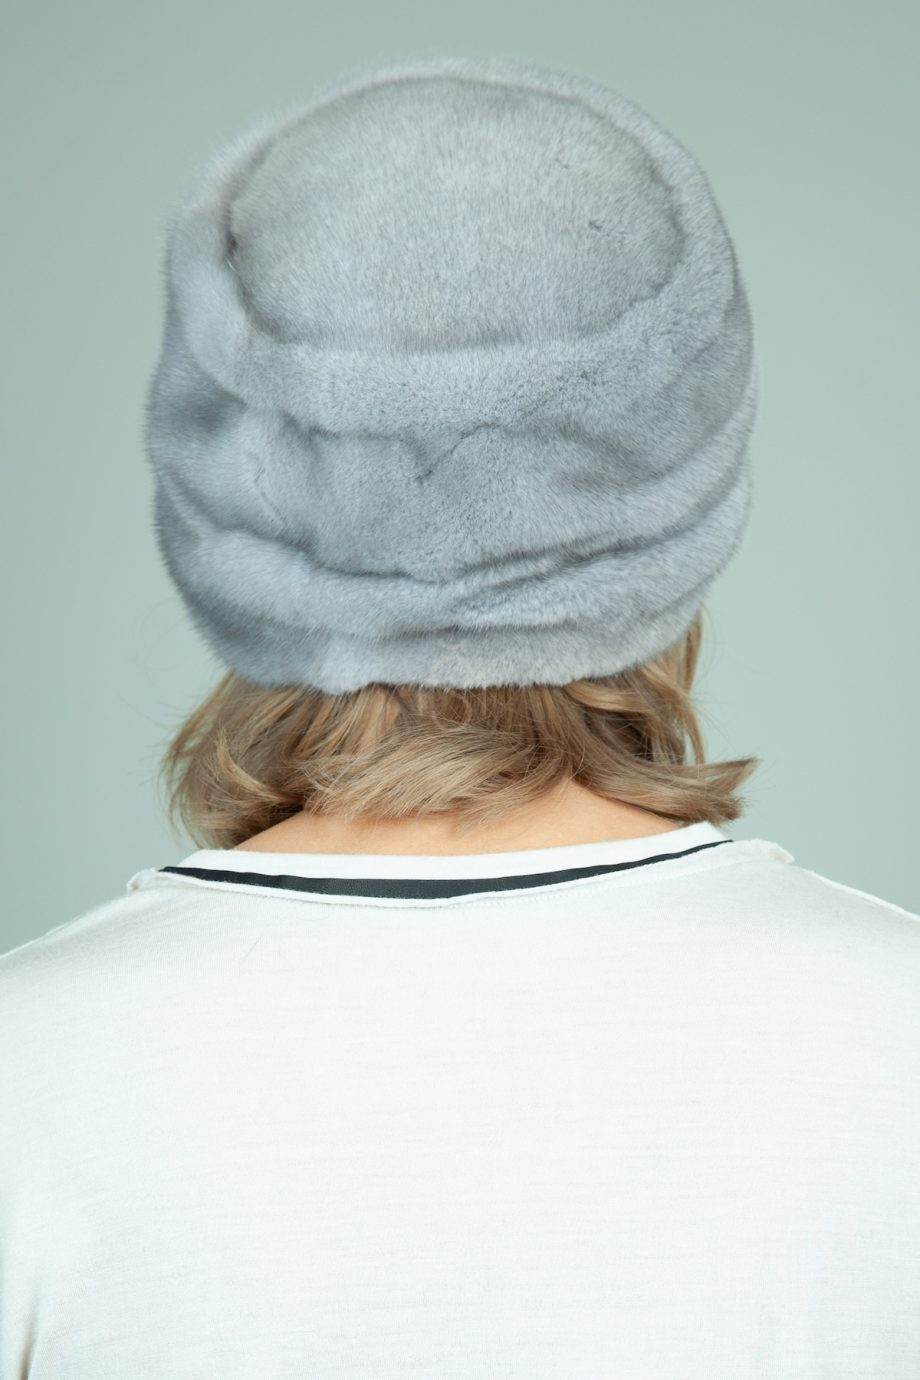 safyro audines kailio kepure zemas cilindras